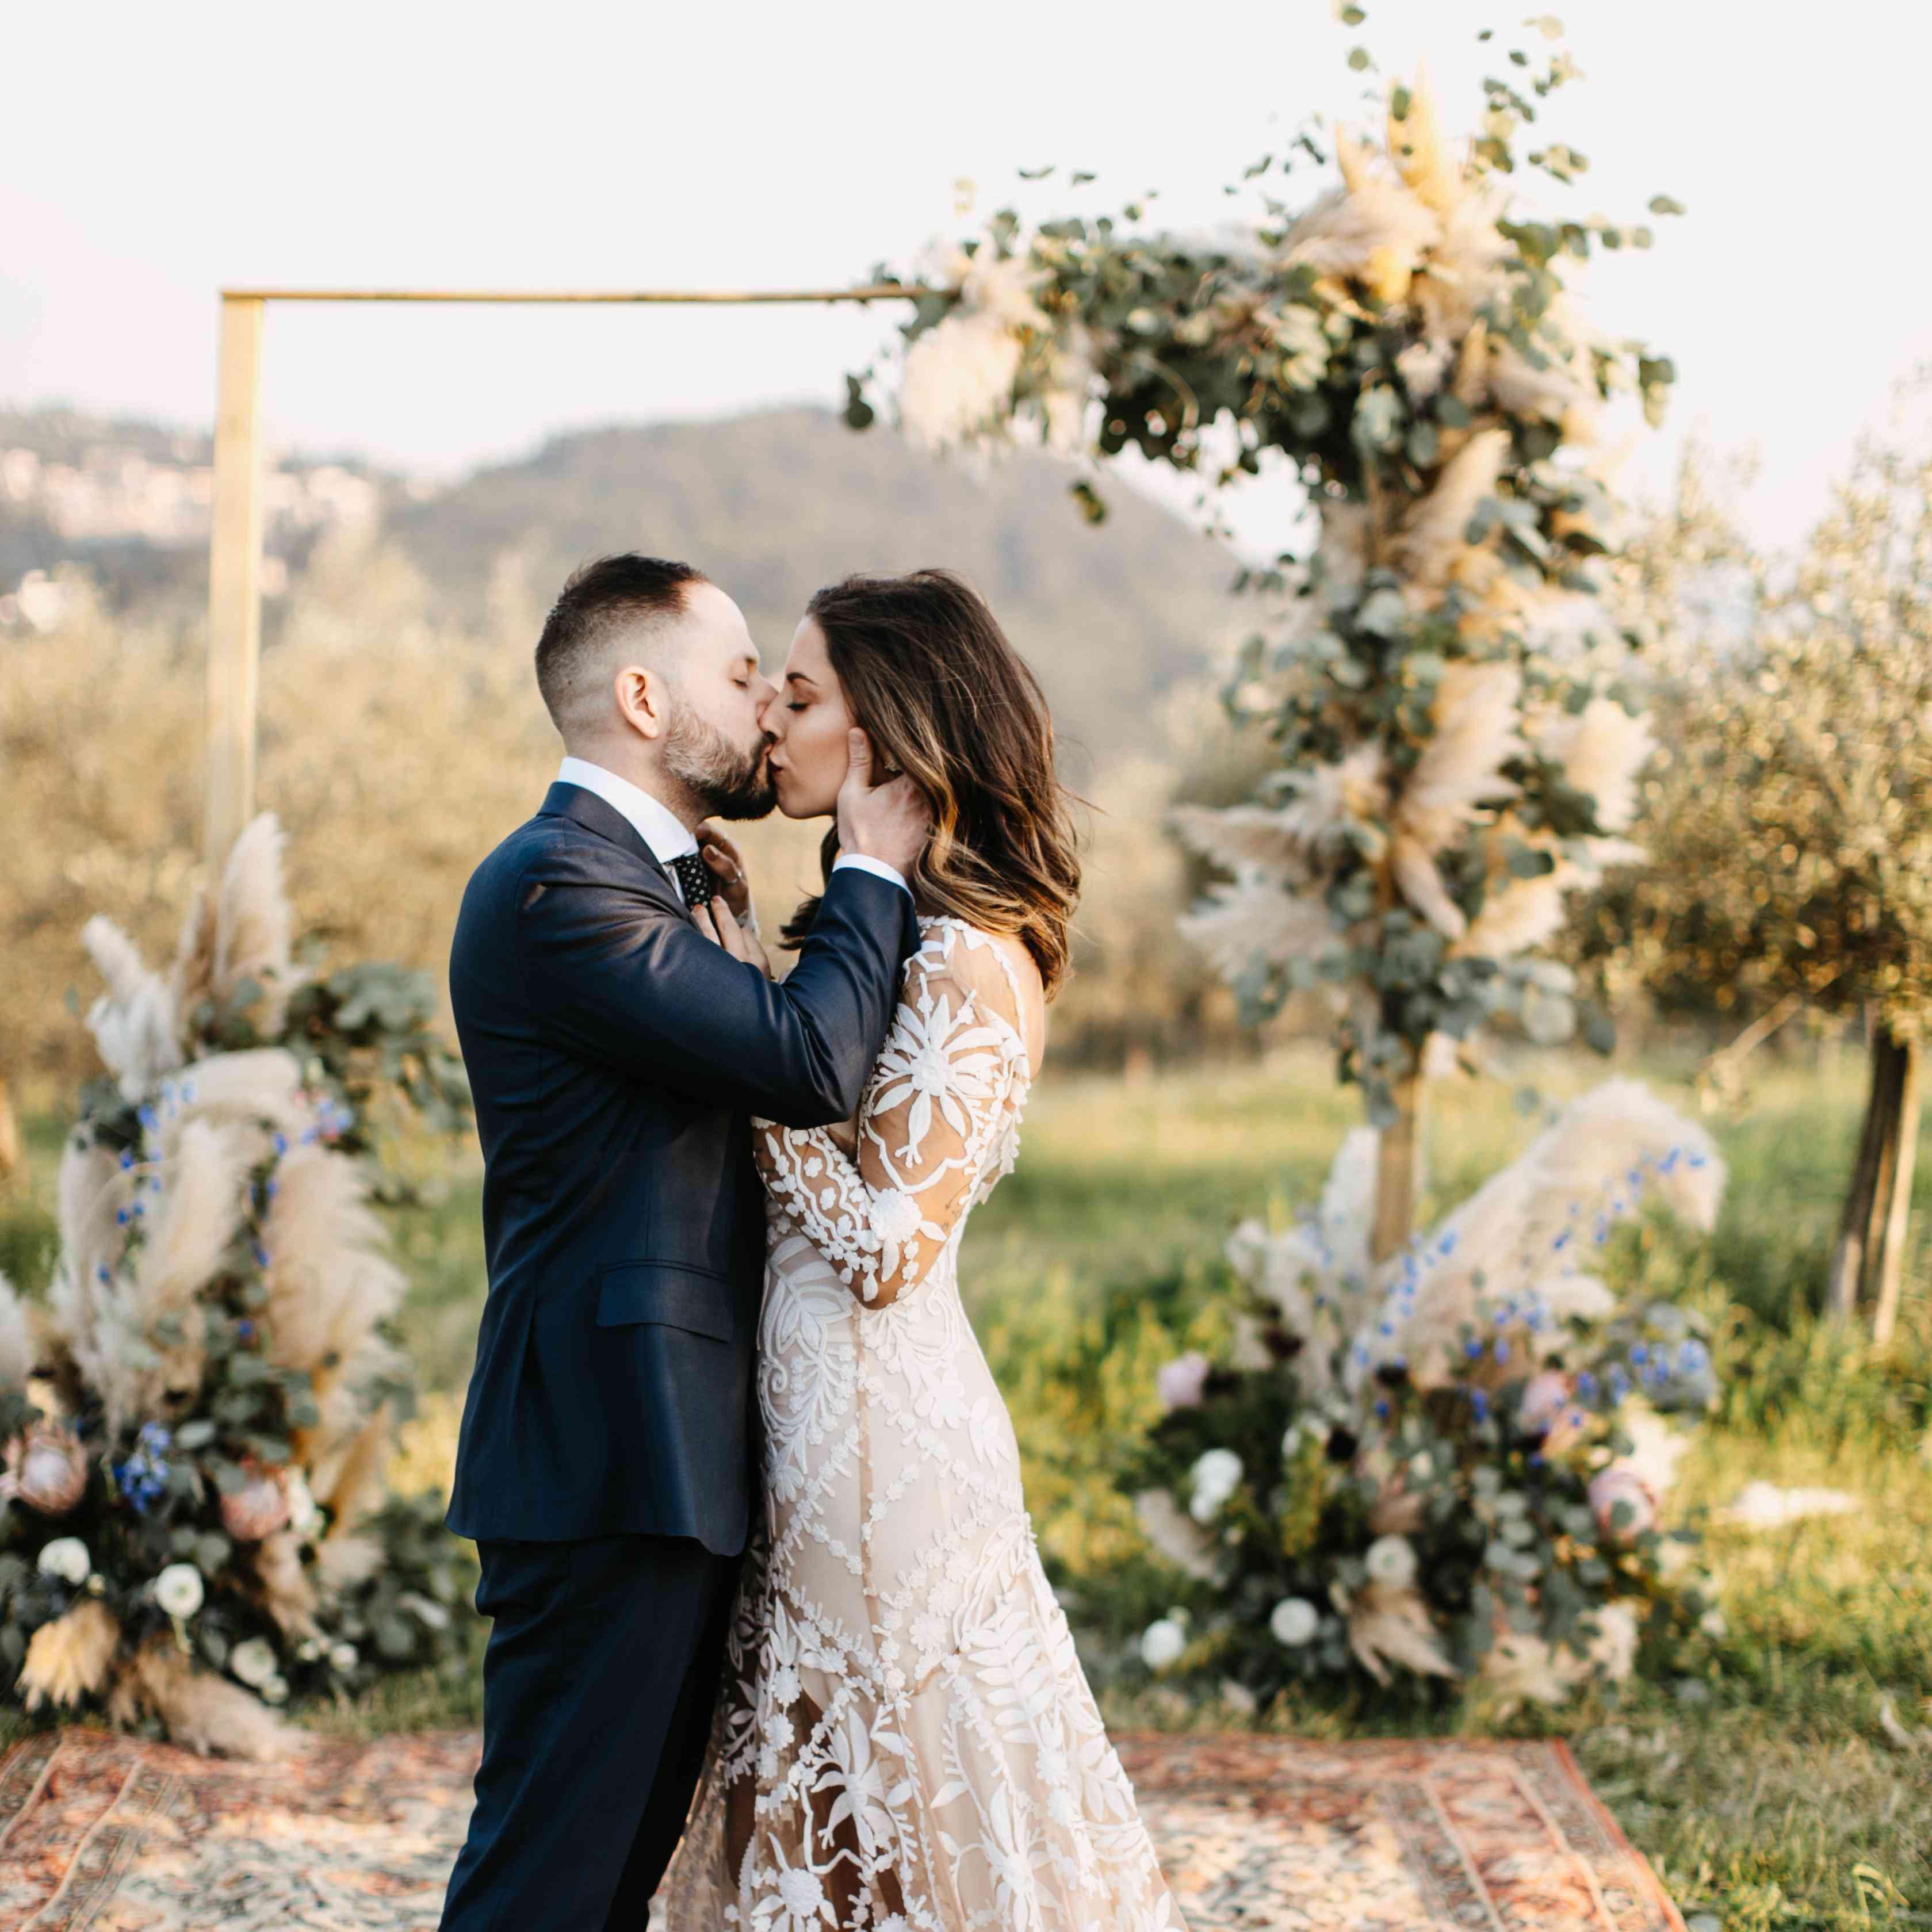 Bohemian Wedding Reception: 50 Wedding Ideas For The Boho Bride